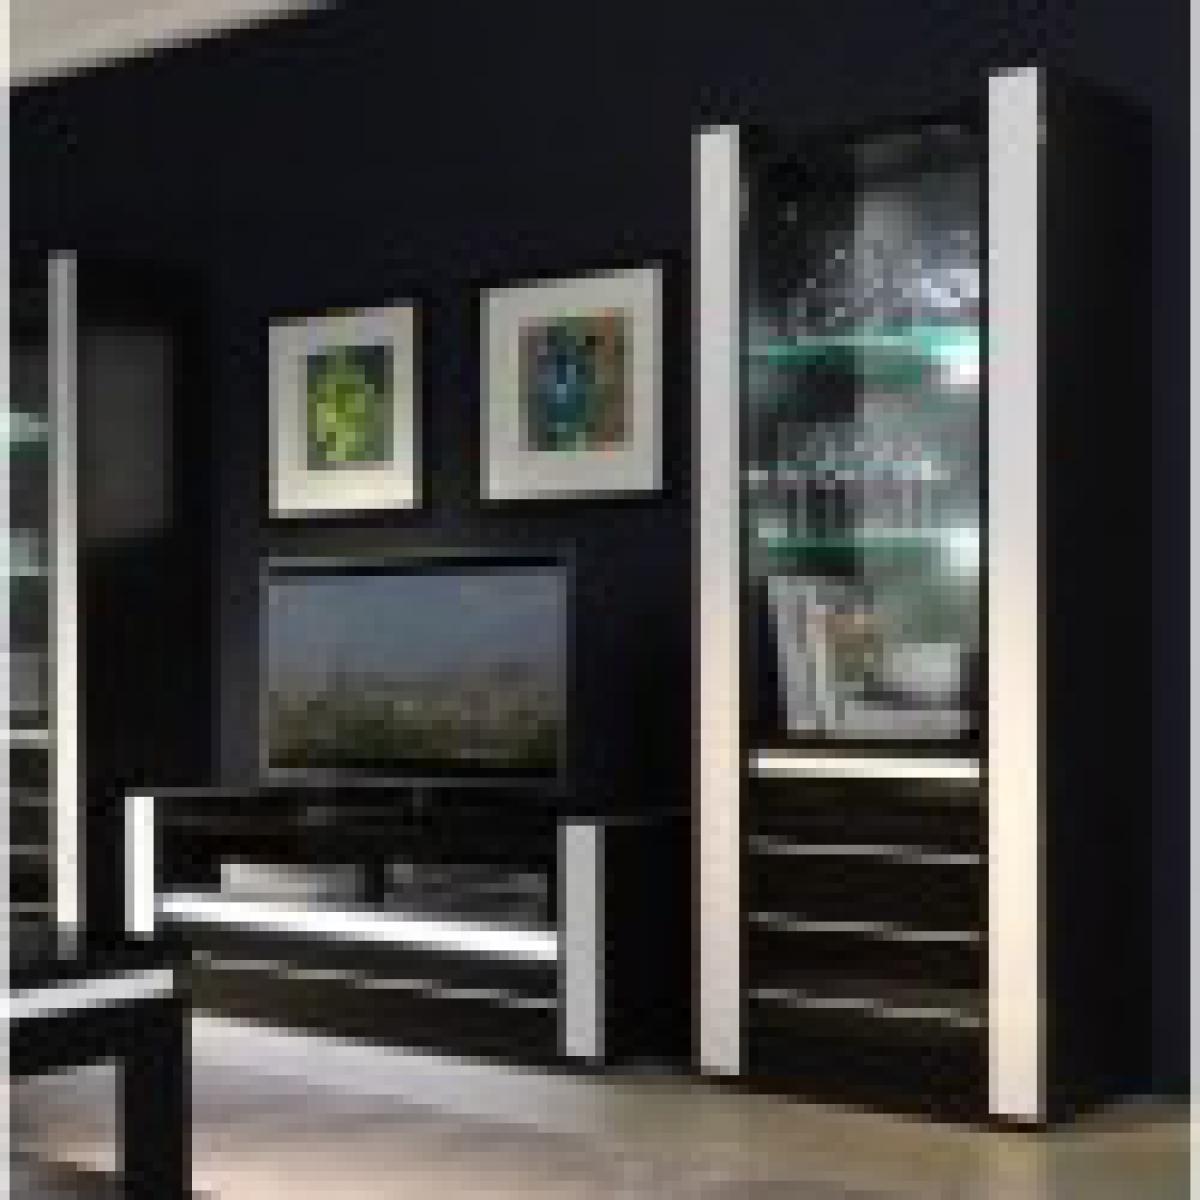 meublorama Ensemble pour votre salon LINA. Meuble tv hifi + vitrine petit modèle + LED. Meubles design haute brillance